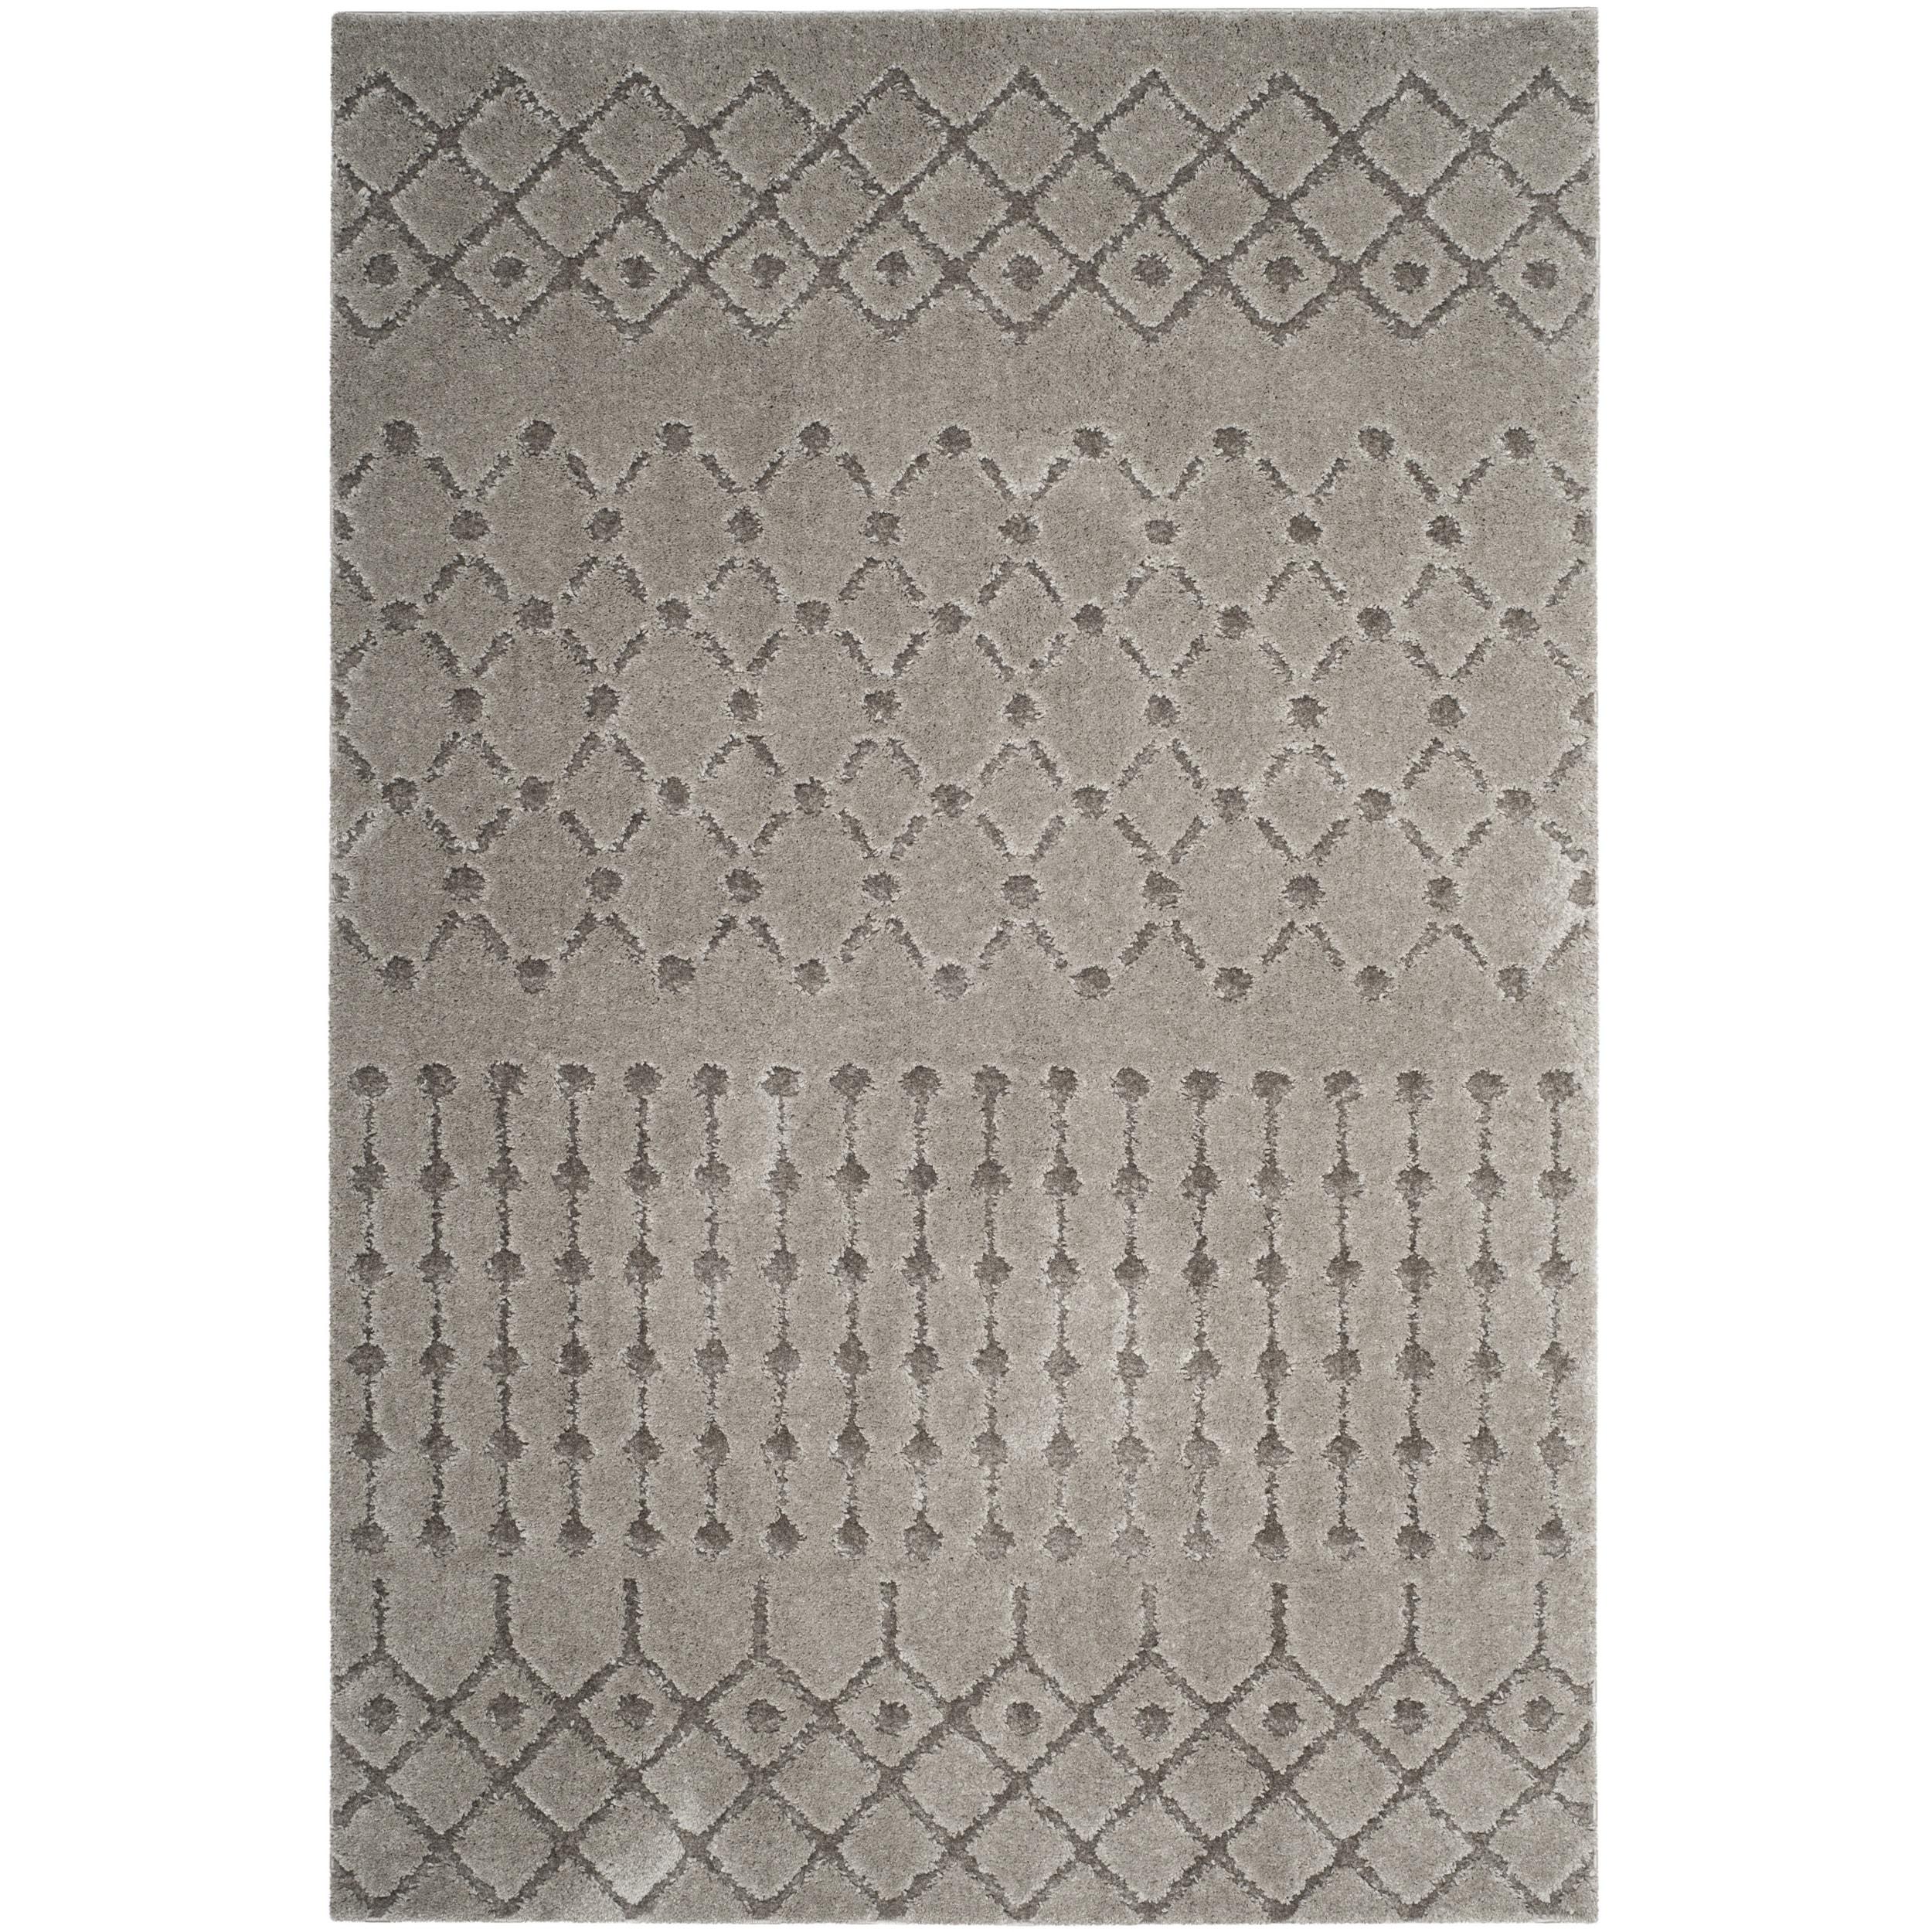 Safavieh Sparta Shag Grey Polyester Area Rug (5' 1 x 7' 6...